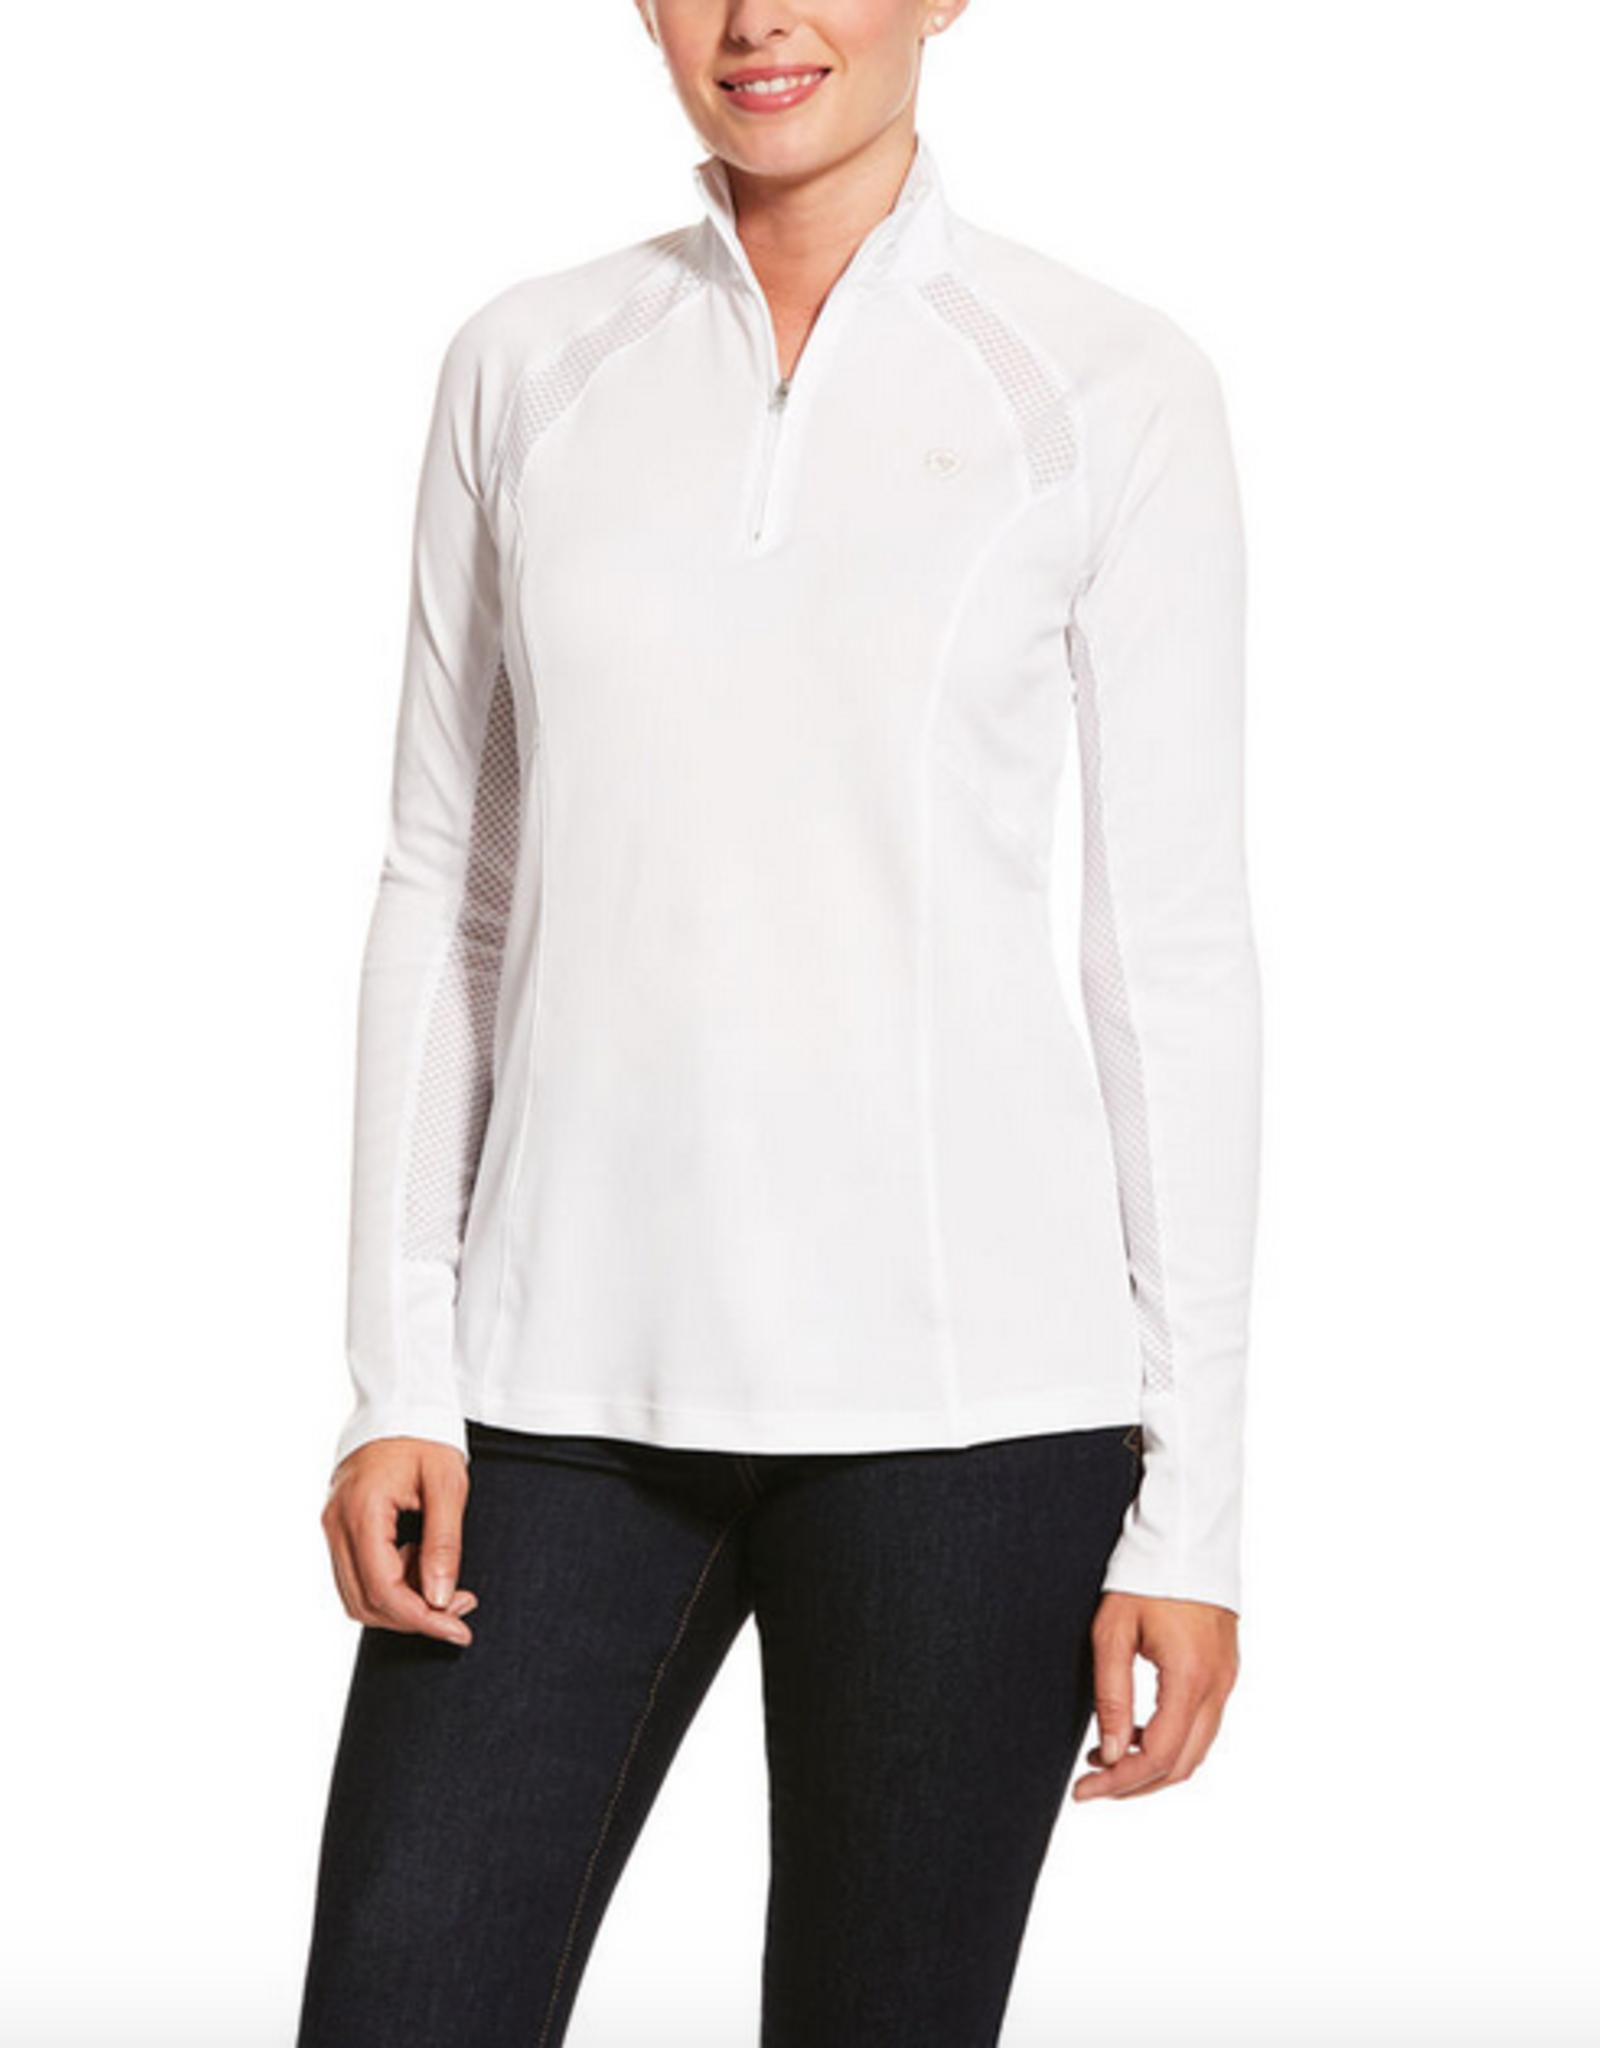 Ariat Ladies' Sunstopper 2.0 Shirt